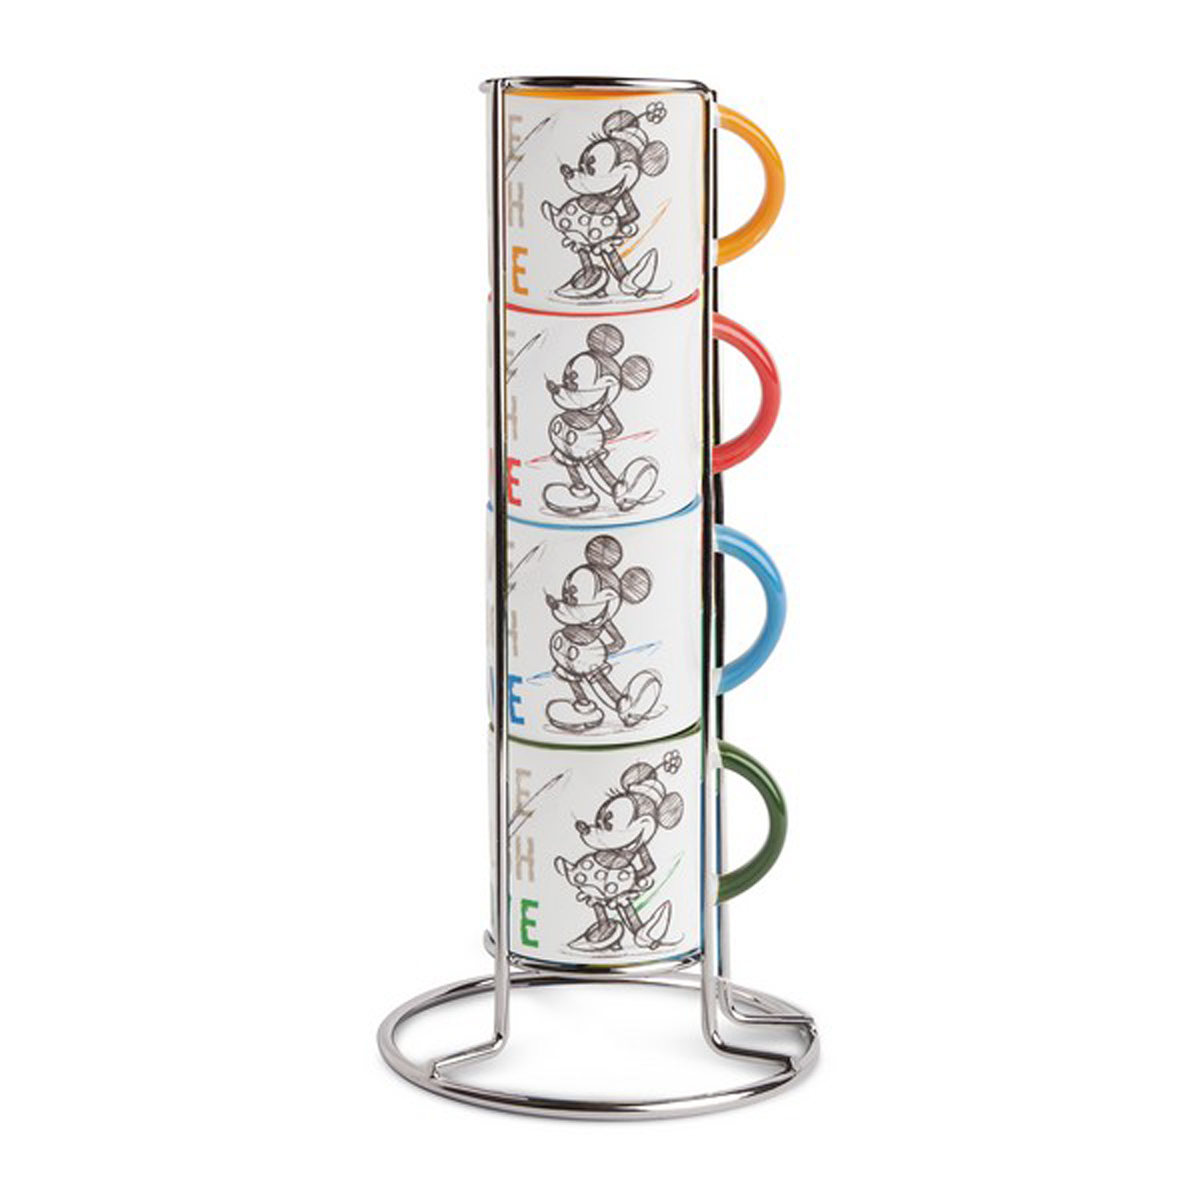 Tour de 4 mini mugs \'Mickey & Minnie\' - mug 6x6 cm - [A2005]